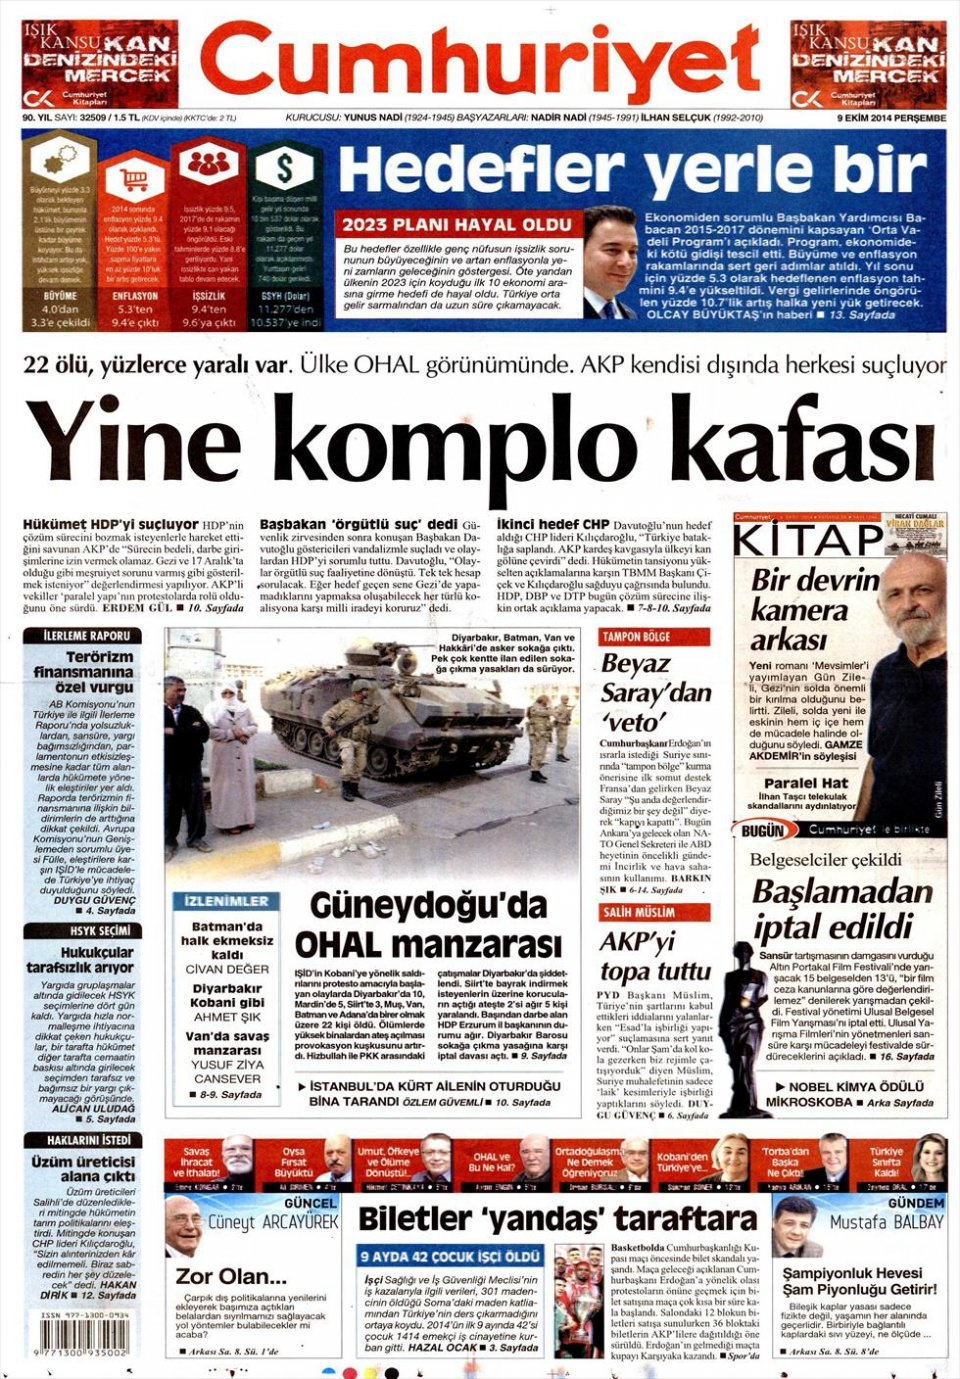 9 Ekim Gazete Manşetleri 4